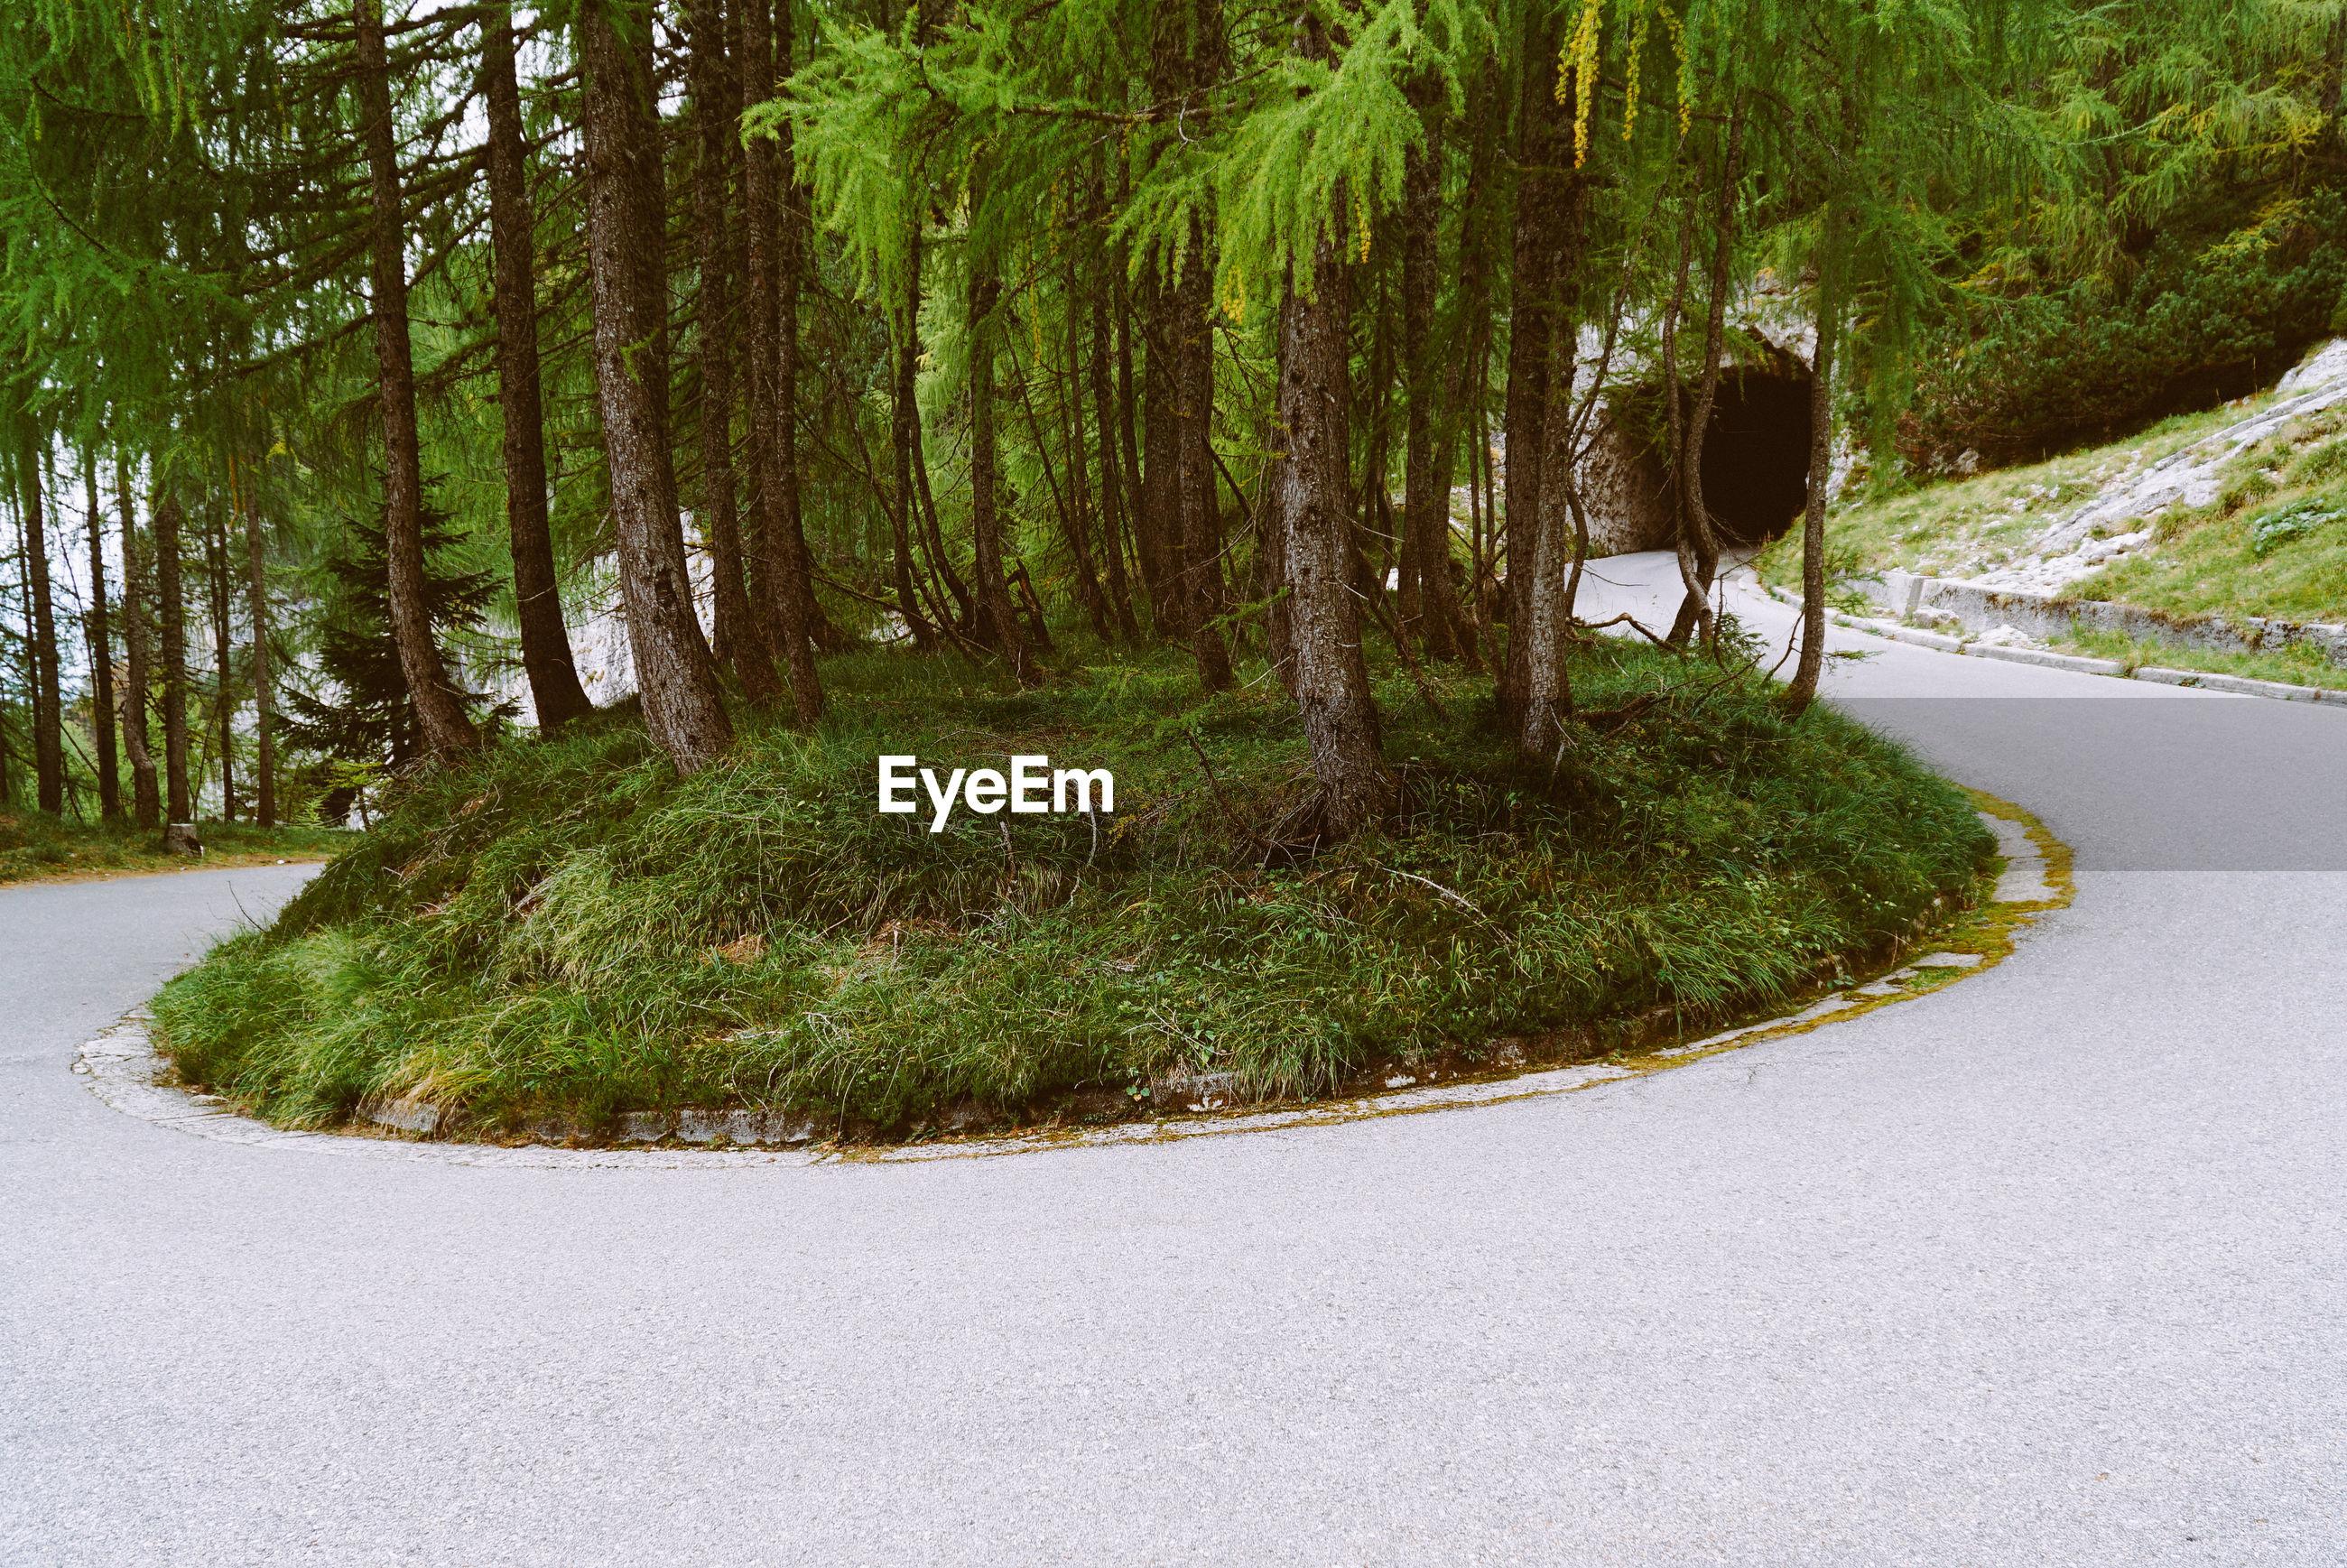 Trees amidst road